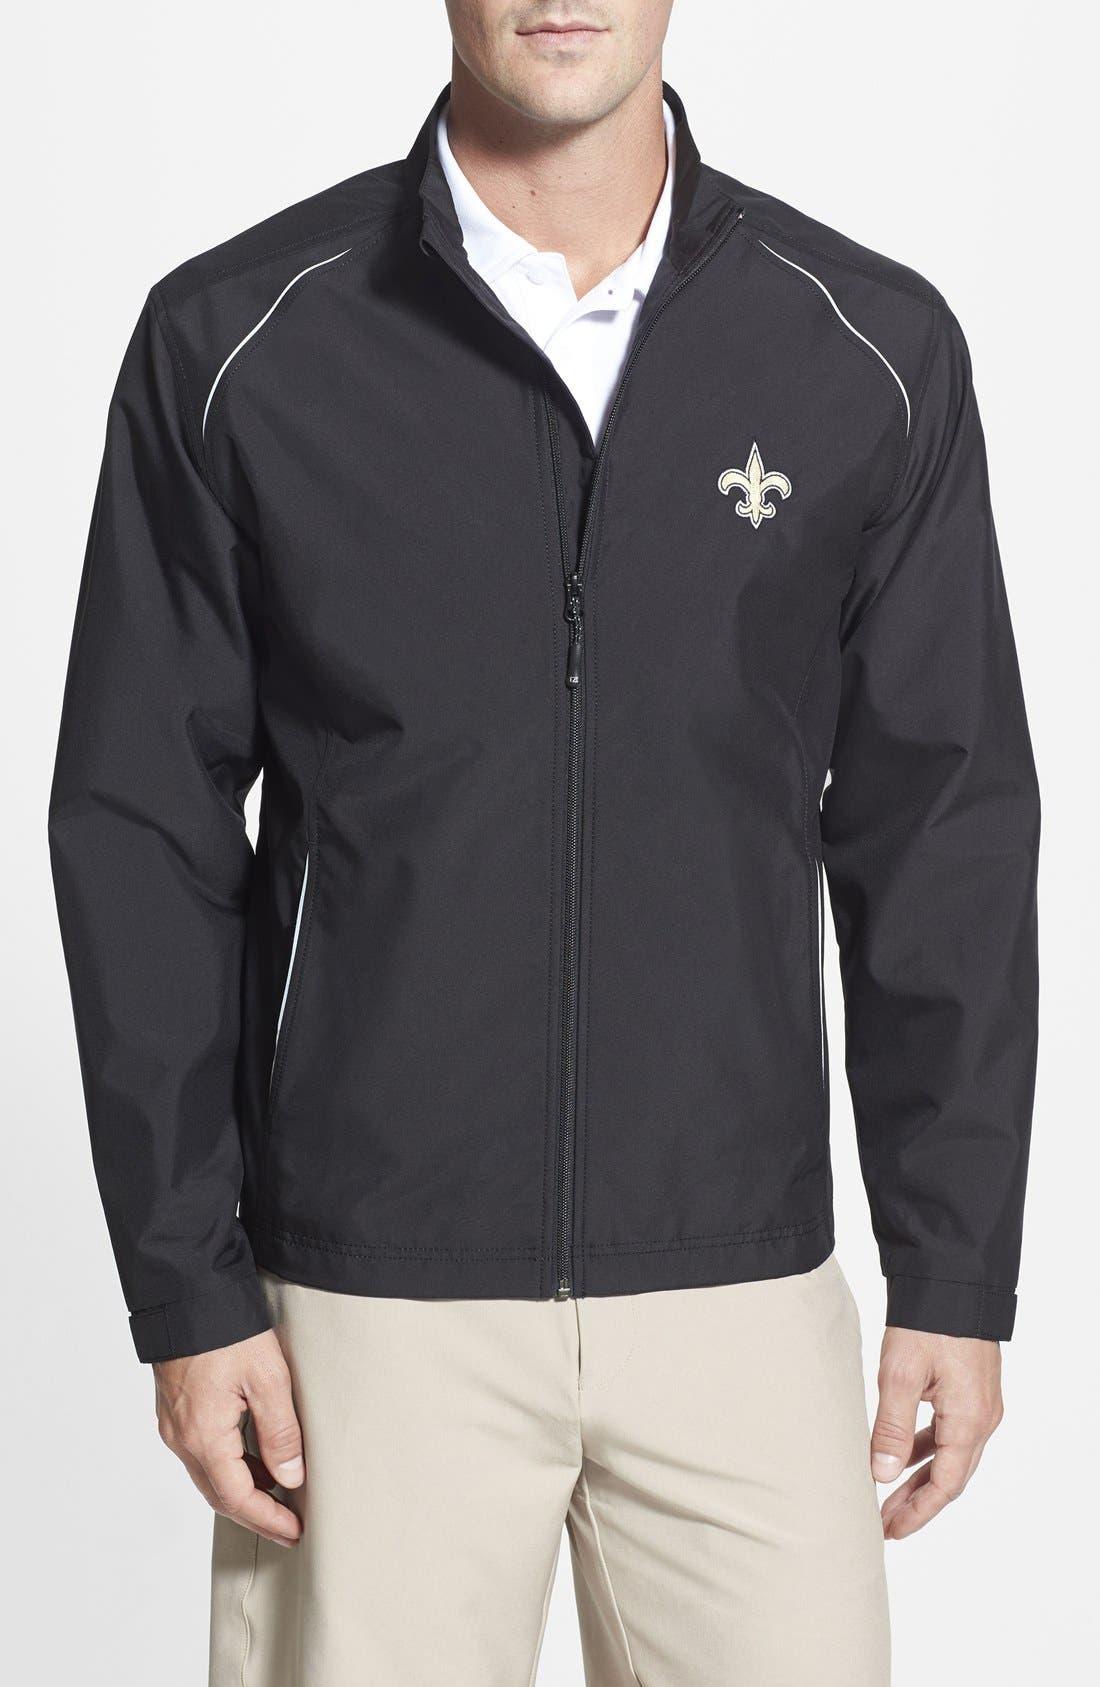 New Orleans Saints - Beacon WeatherTec Wind & Water Resistant Jacket,                         Main,                         color, Black